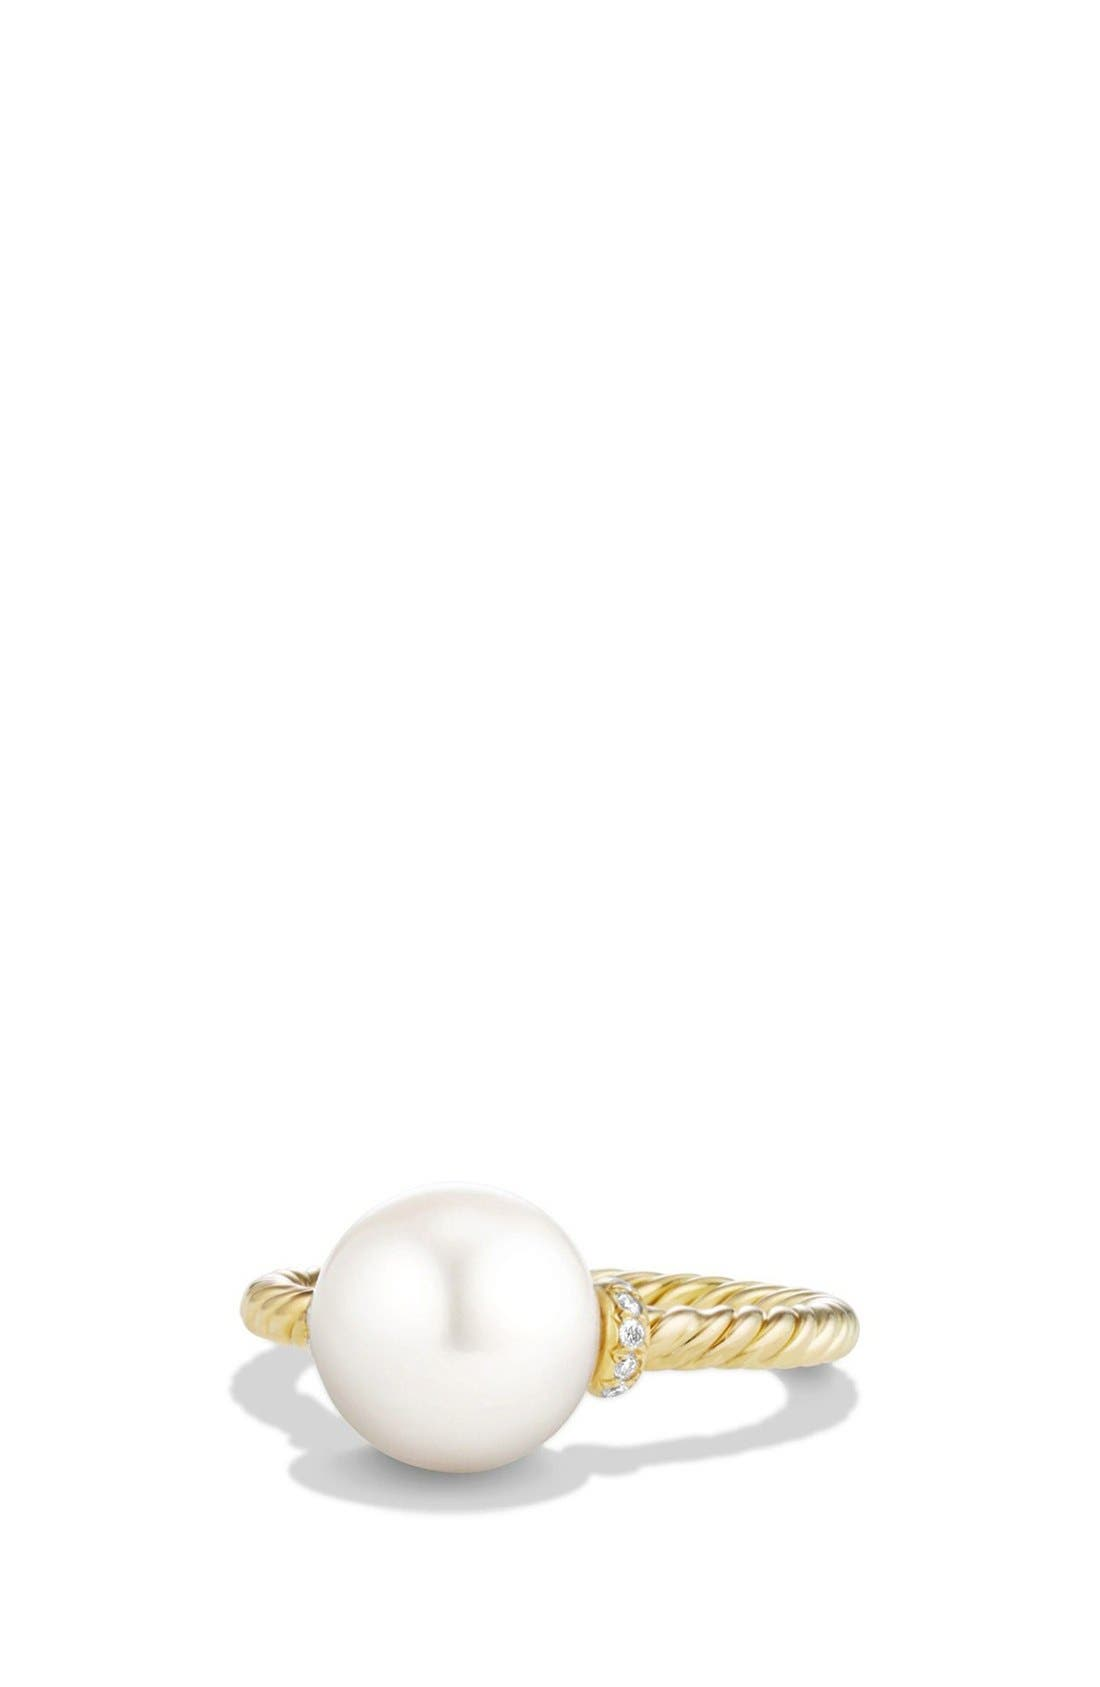 Main Image - David Yurman 'Solari' Station Ring with Diamonds and Pearls